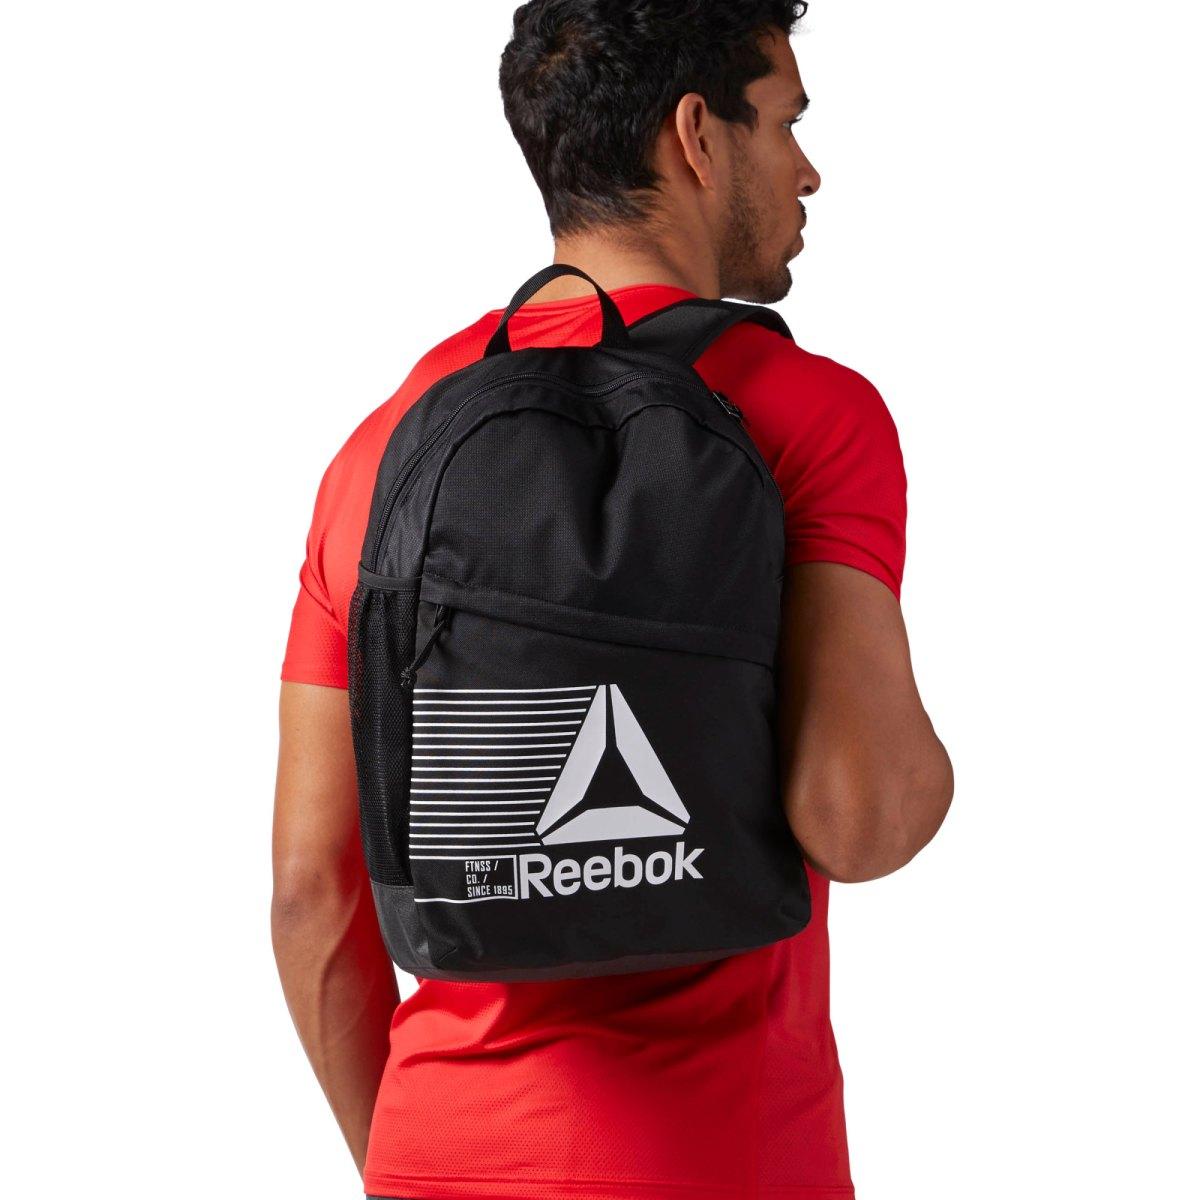 Reebok_Essentials_Backpack_Black_CE0926_04_standard